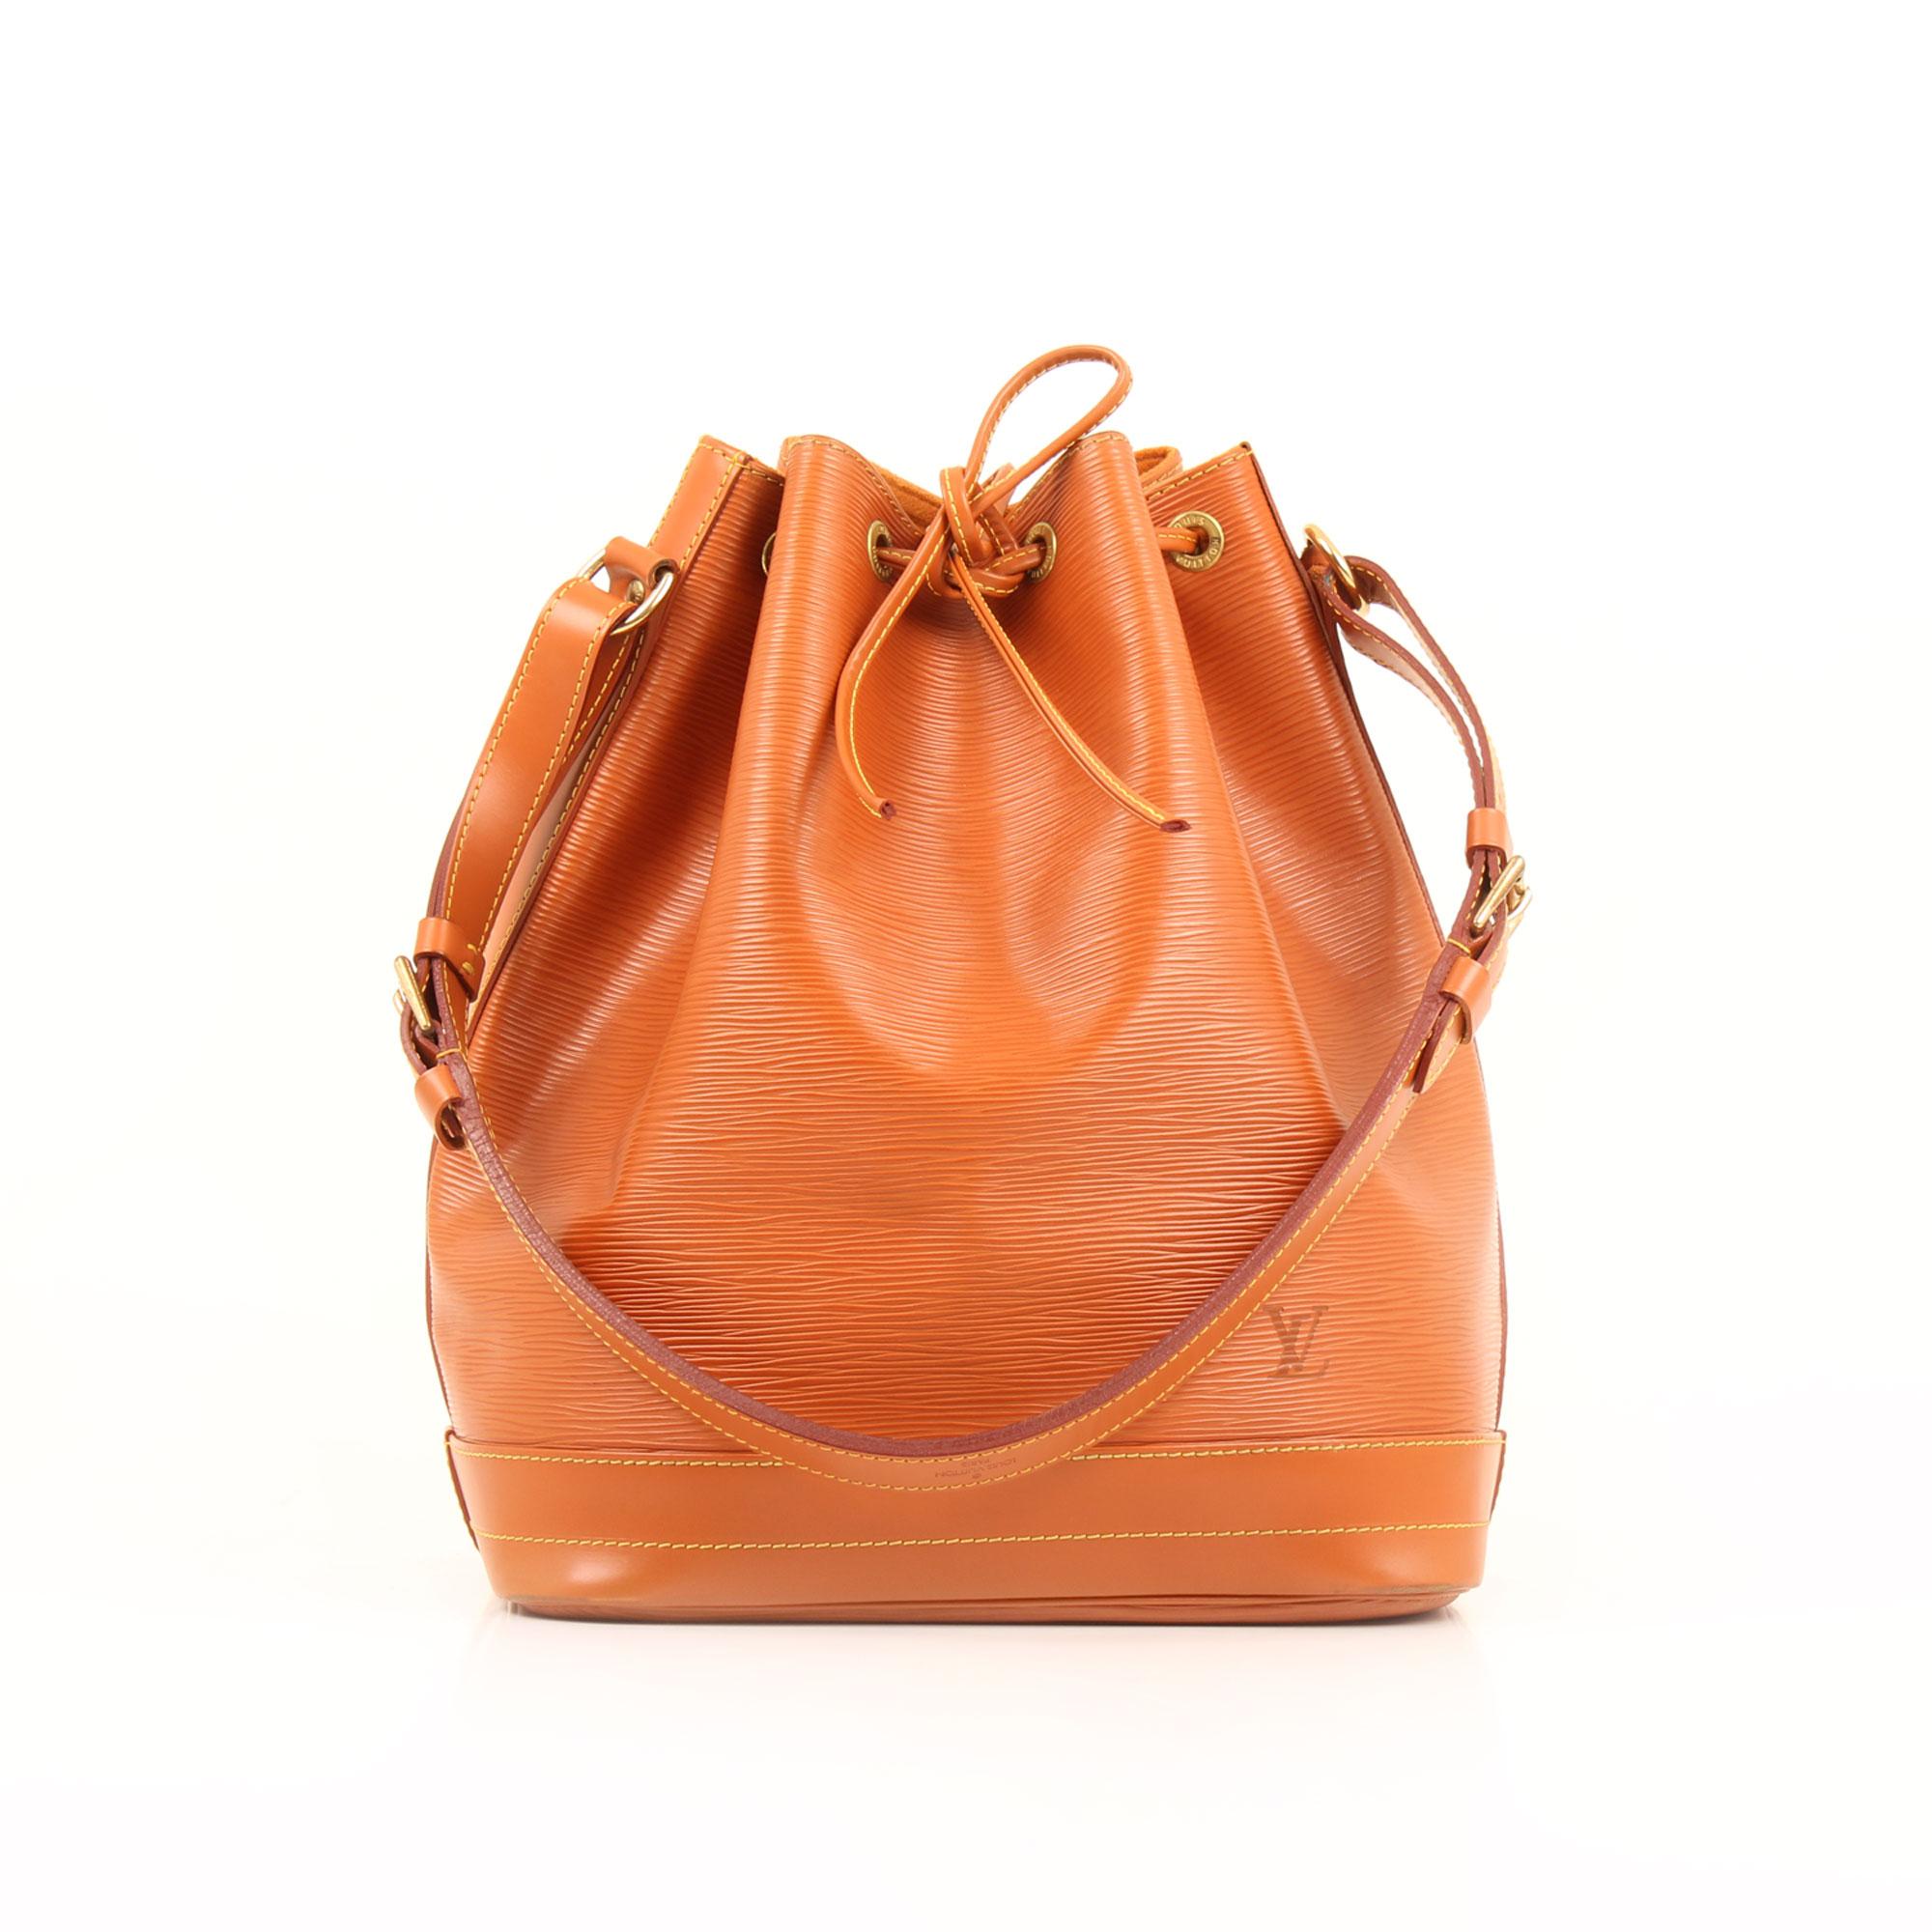 Imagen frontal del bolso louis vuitton noe piel epi marron